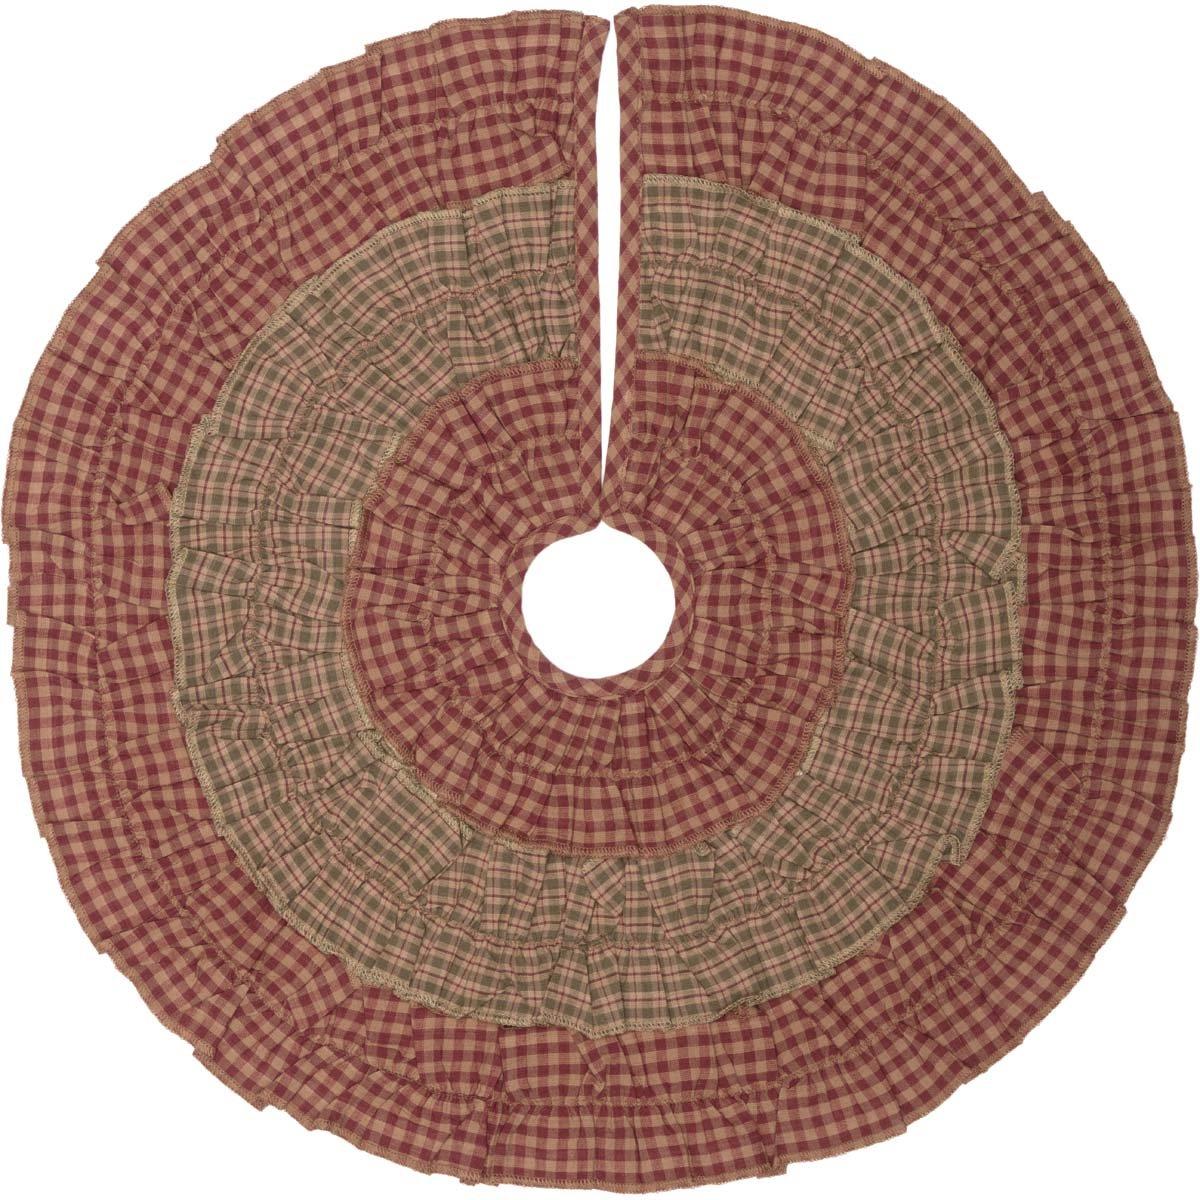 VHC Brands Holiday Decor-Sequoia Red Mini Tree Skirt, 21'' Diameter